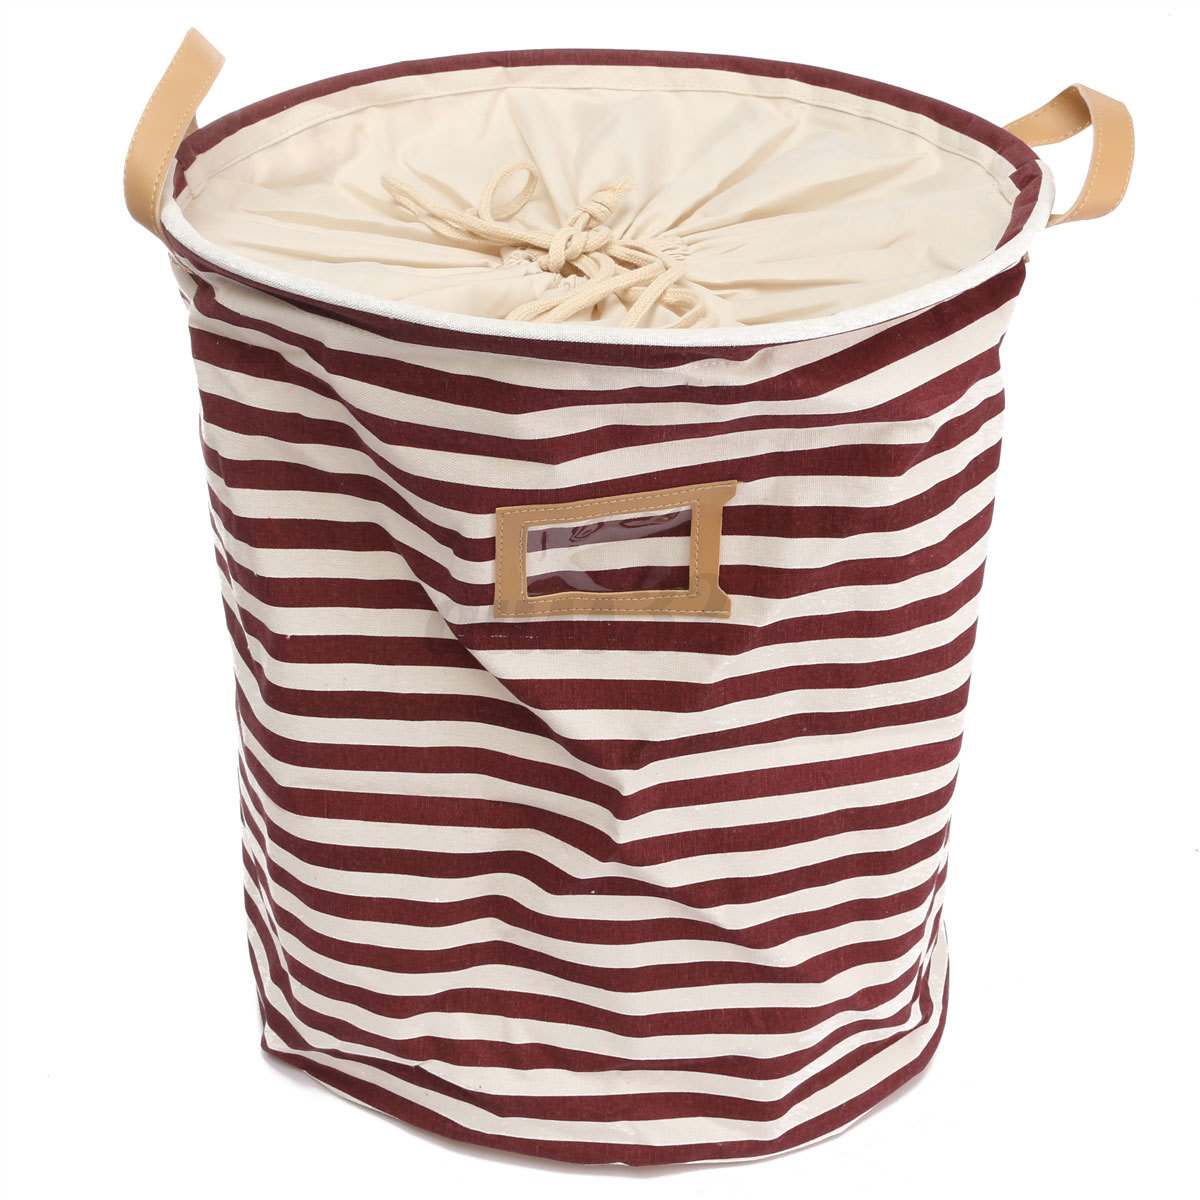 Cotton Linen Sorter Bag Washing Laundry Hamper Toys